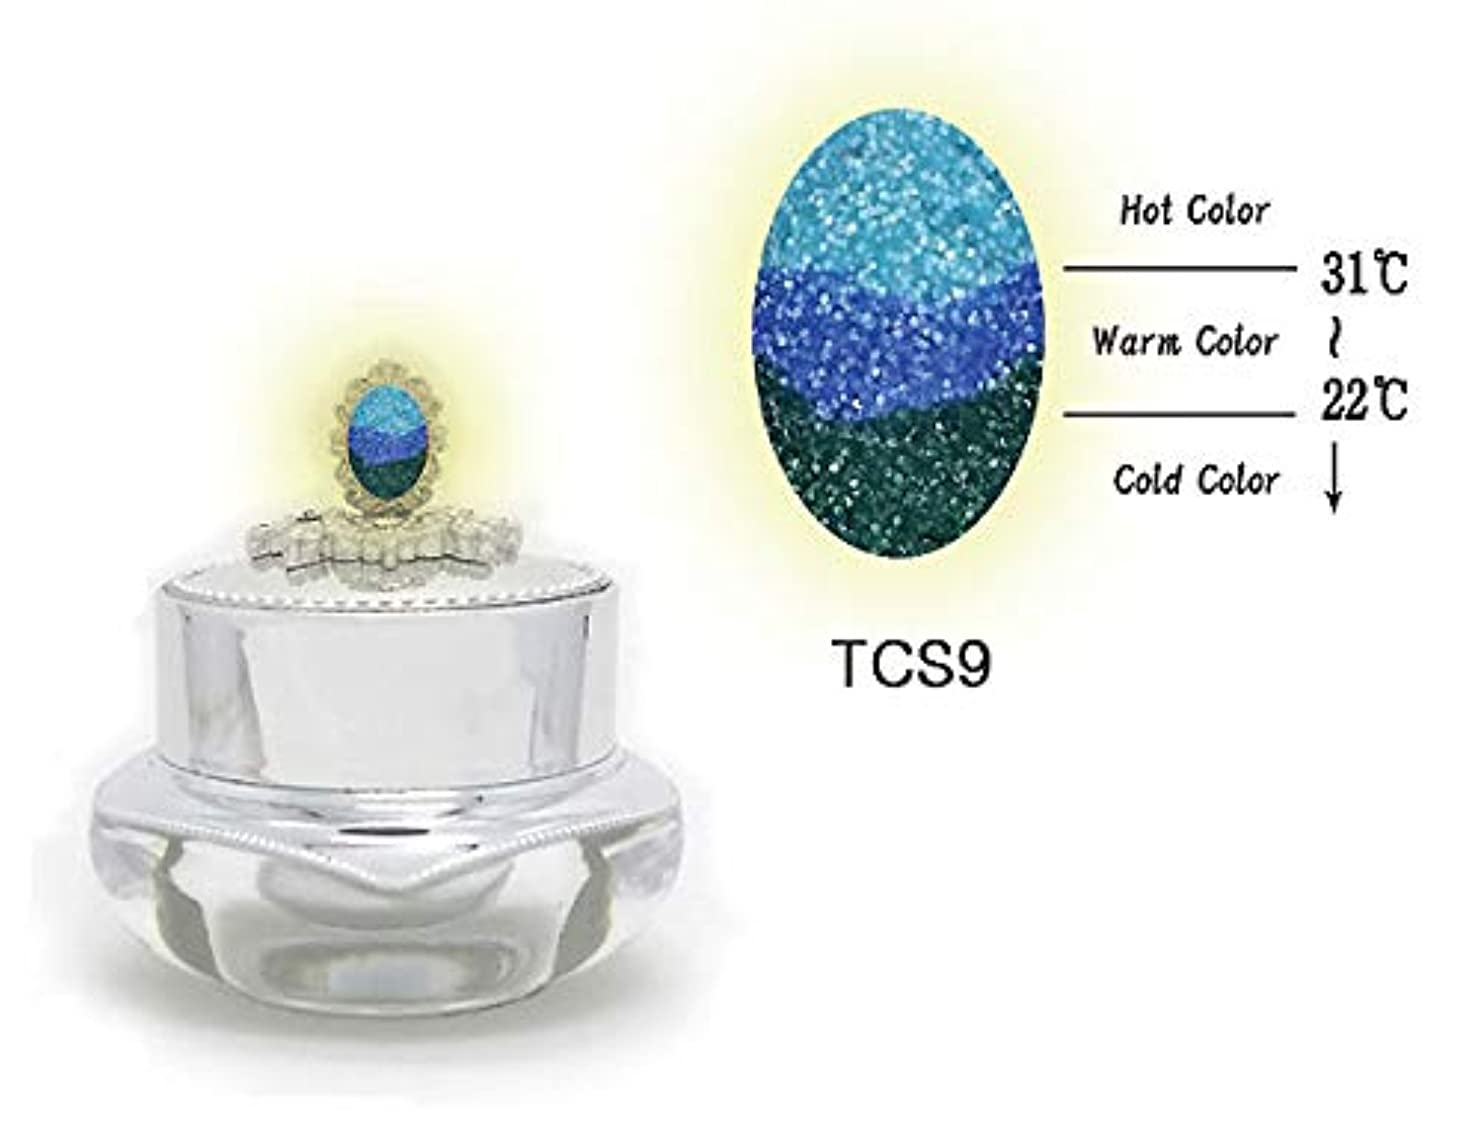 KENZICO (ケンジコ) Triple Sugar Gel一般用3g 【TCS9】 3つの色に変わる夜光ジェル トリプルシュガージェル